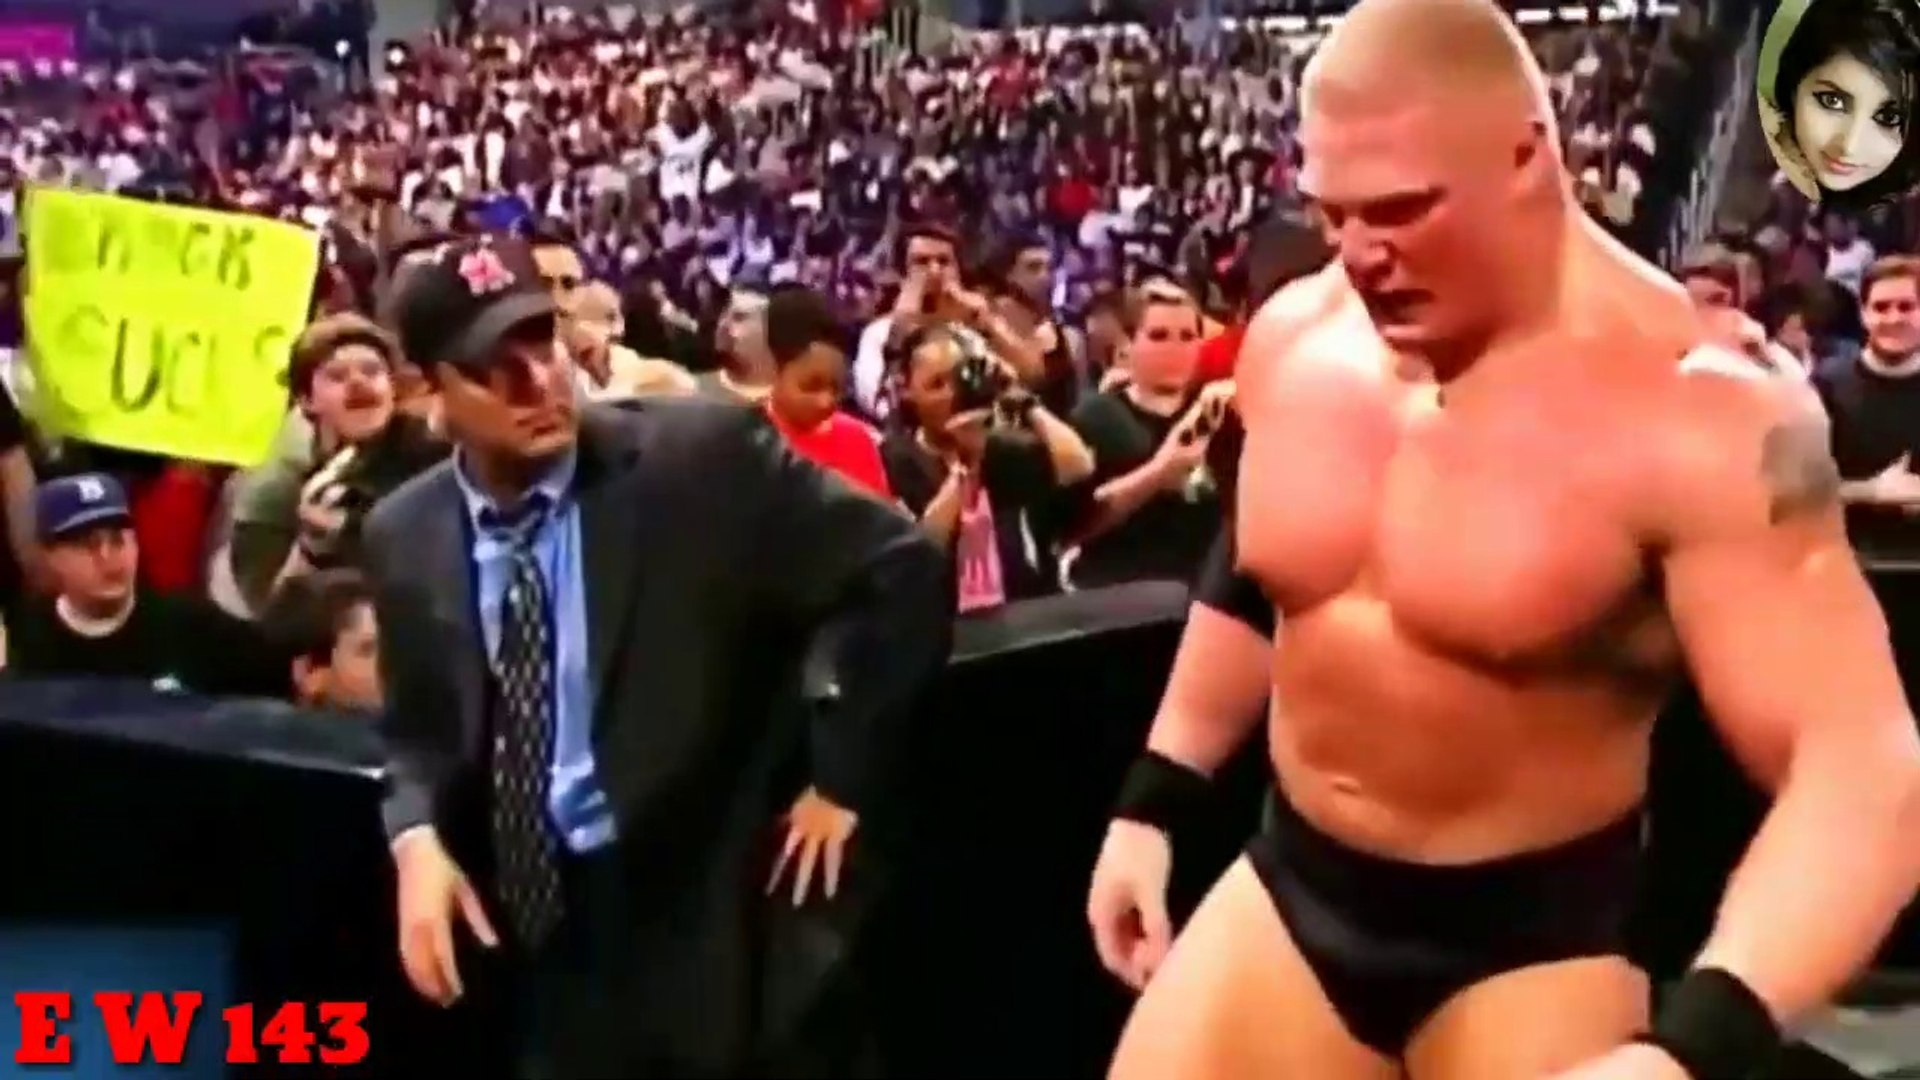 Undertaker Vs Brock Lesnar 2020 - Brock Vs Undertaker Full Match 2020